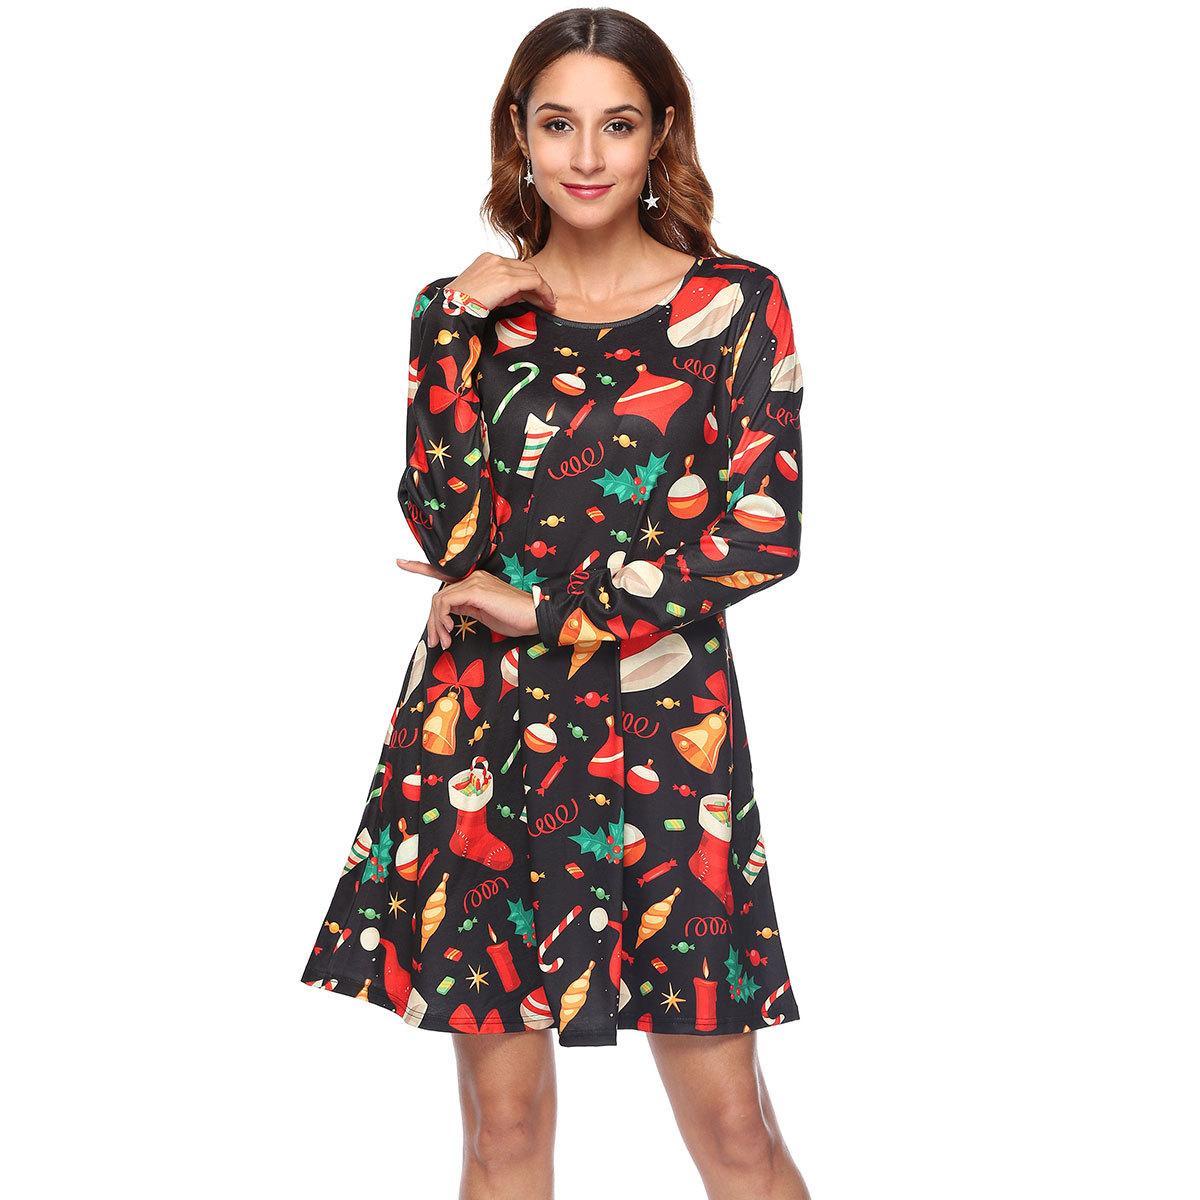 Christmas Print Dresses 2020 2020 Womens Long Sleeves Christmas Print Dresses Ladies Flared